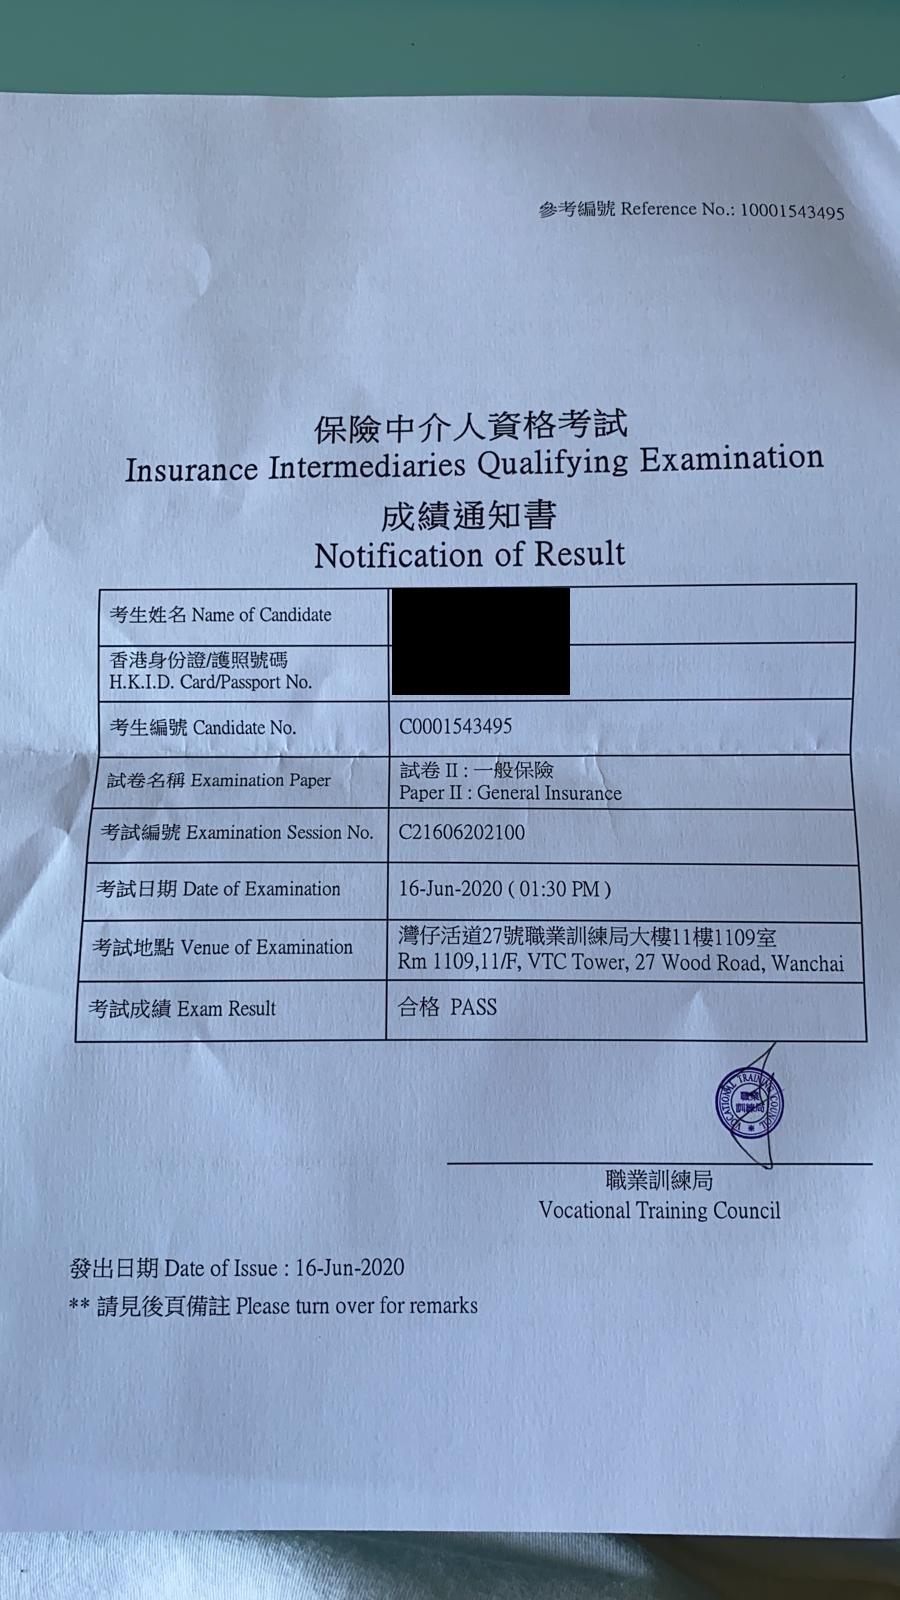 MKC 16/06/2020 IIQE Paper 2 保險中介人資格考試卷二 Pass